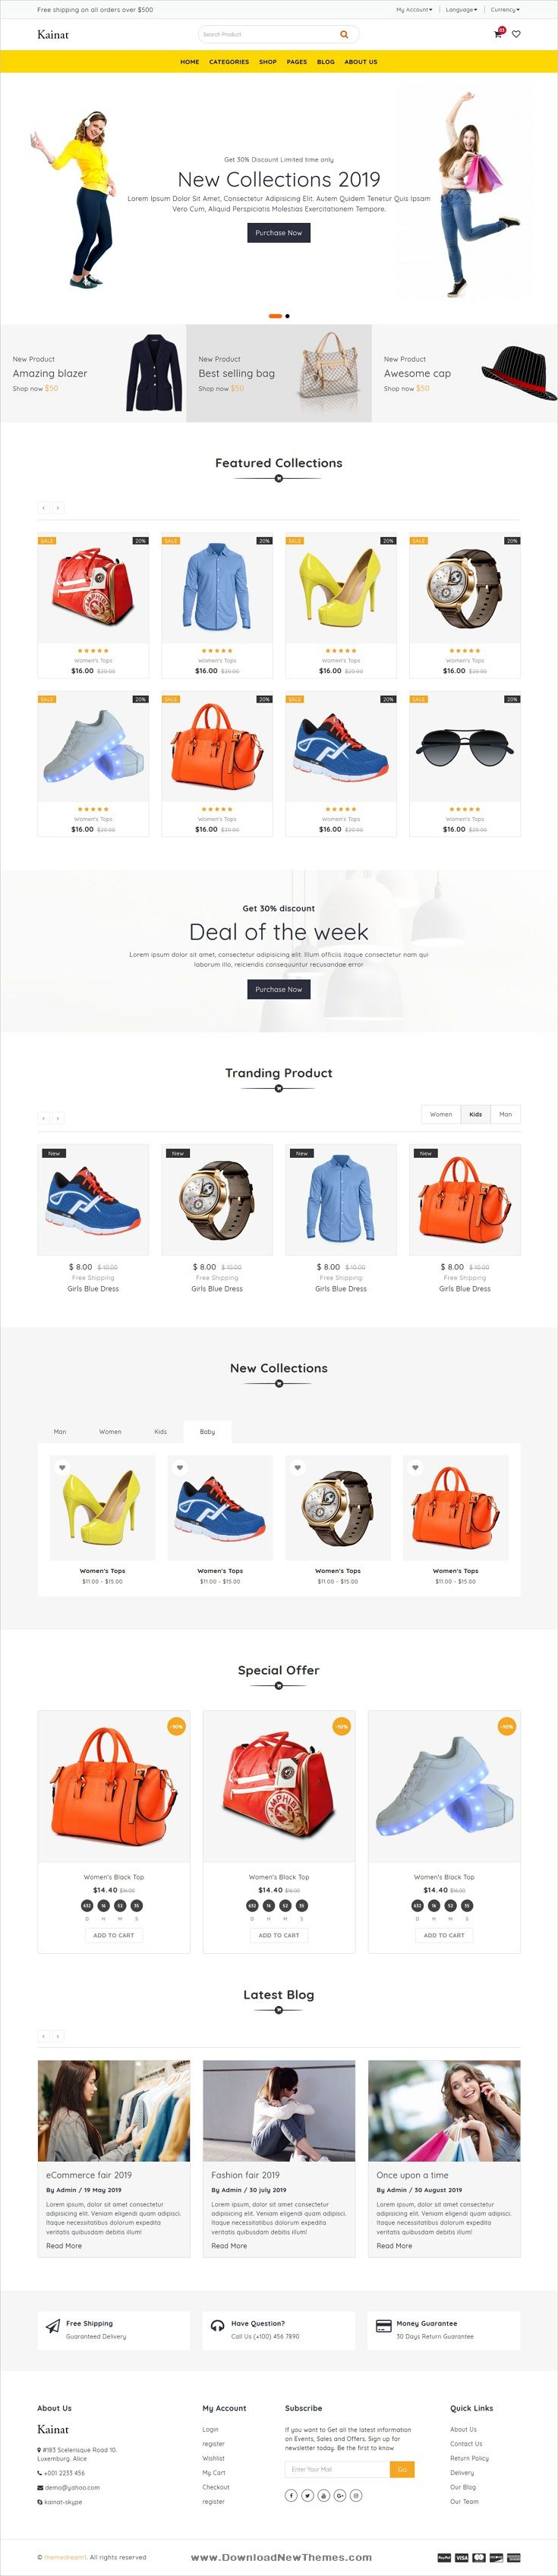 Kainat Multipurpose Bootstrap 4 Template